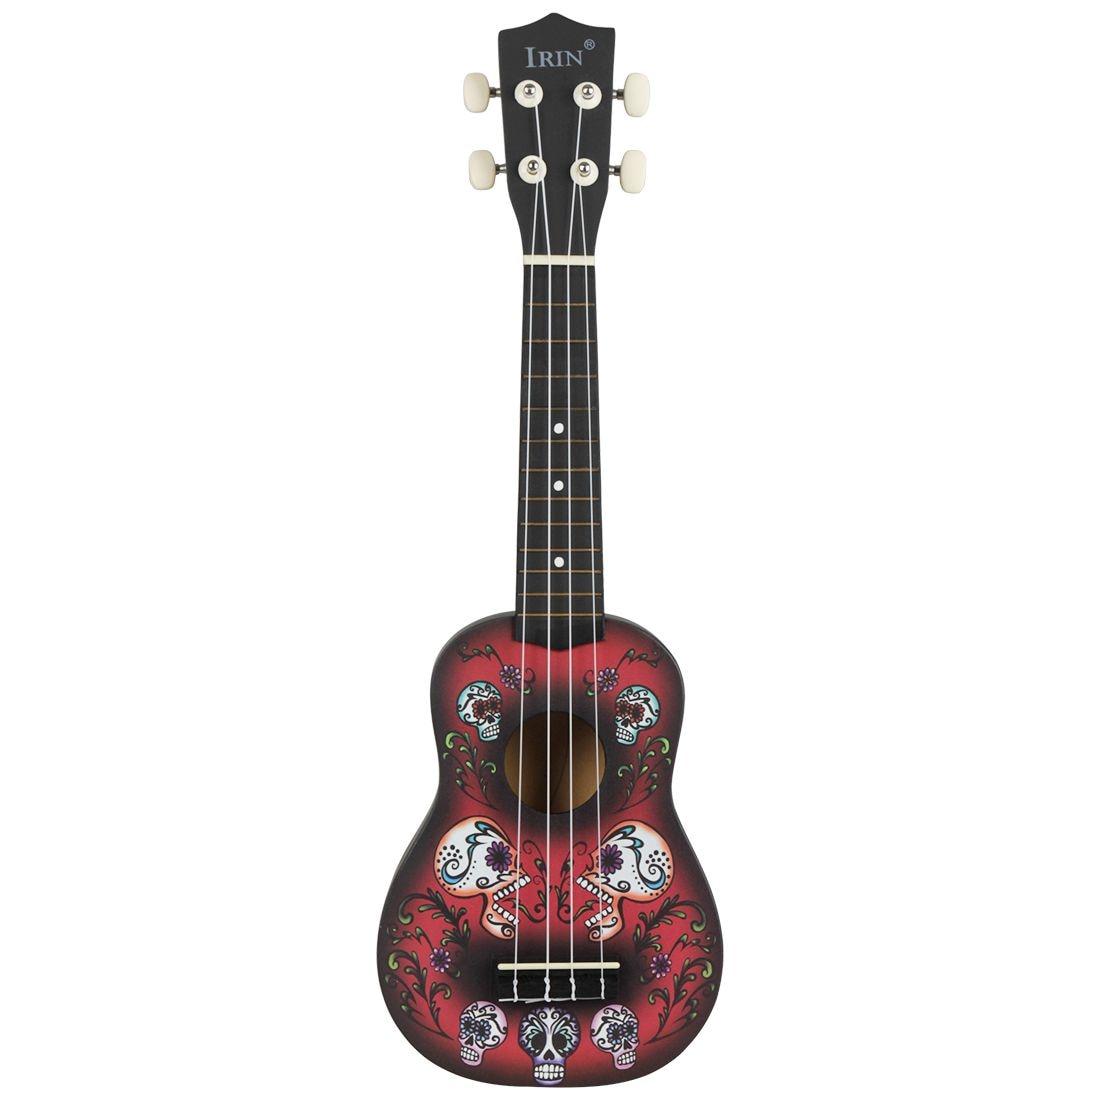 IRIN 21 Inch 15 Frets Soprano Ukulele Uke 4 Nylon Strings Basswood Guitar Dolphin Pattern Universal Acoustic Instrument